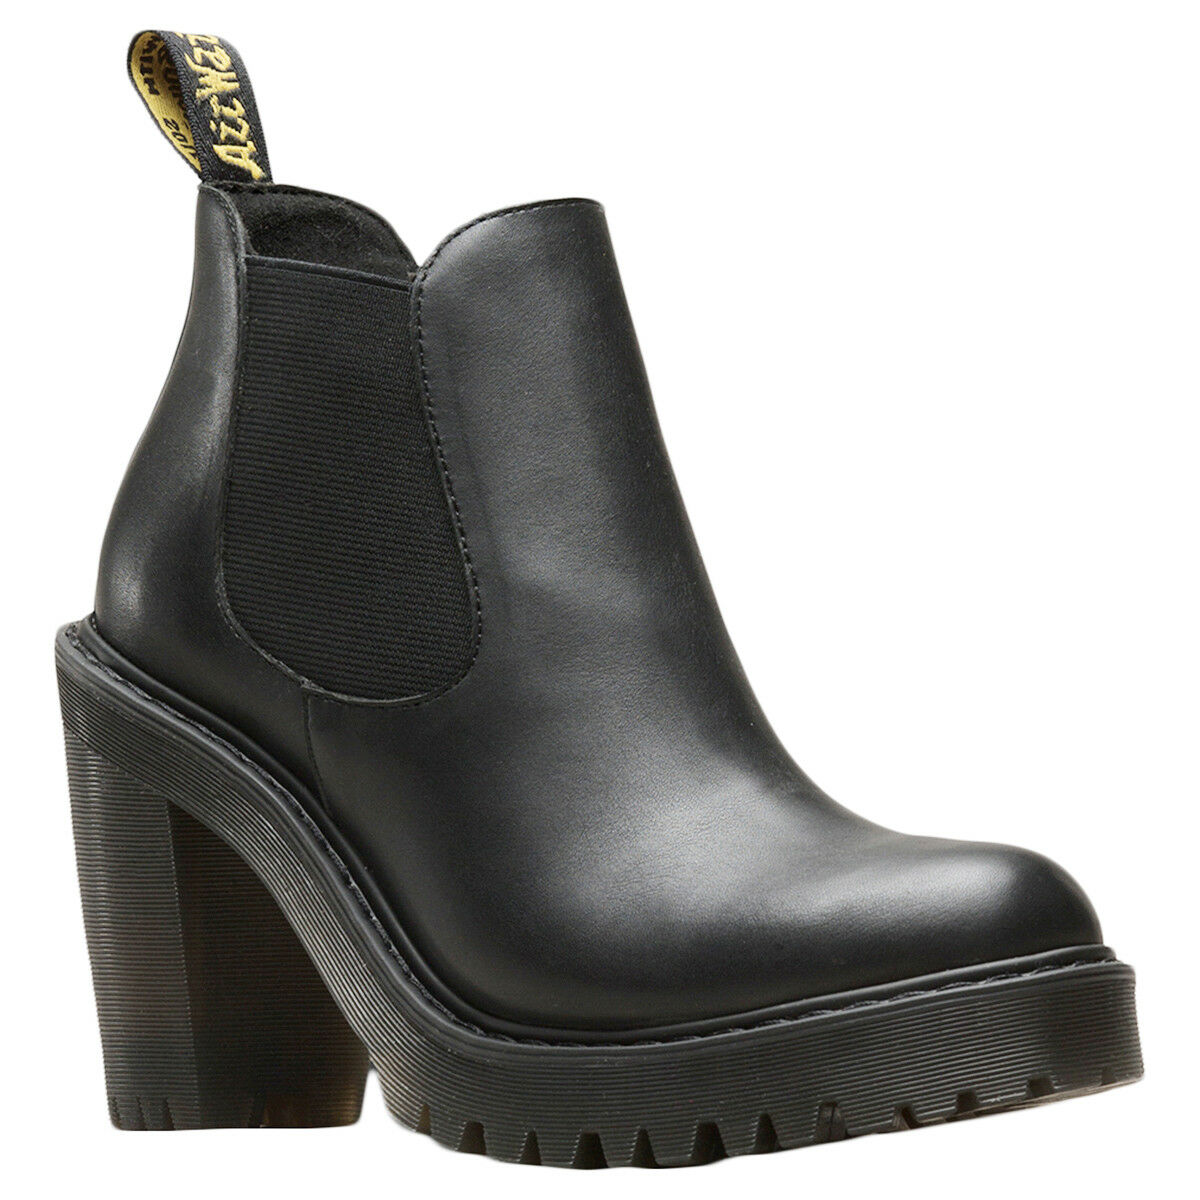 Dr. Martens Hurston sendal Leather bloque heel chelsea señora botas